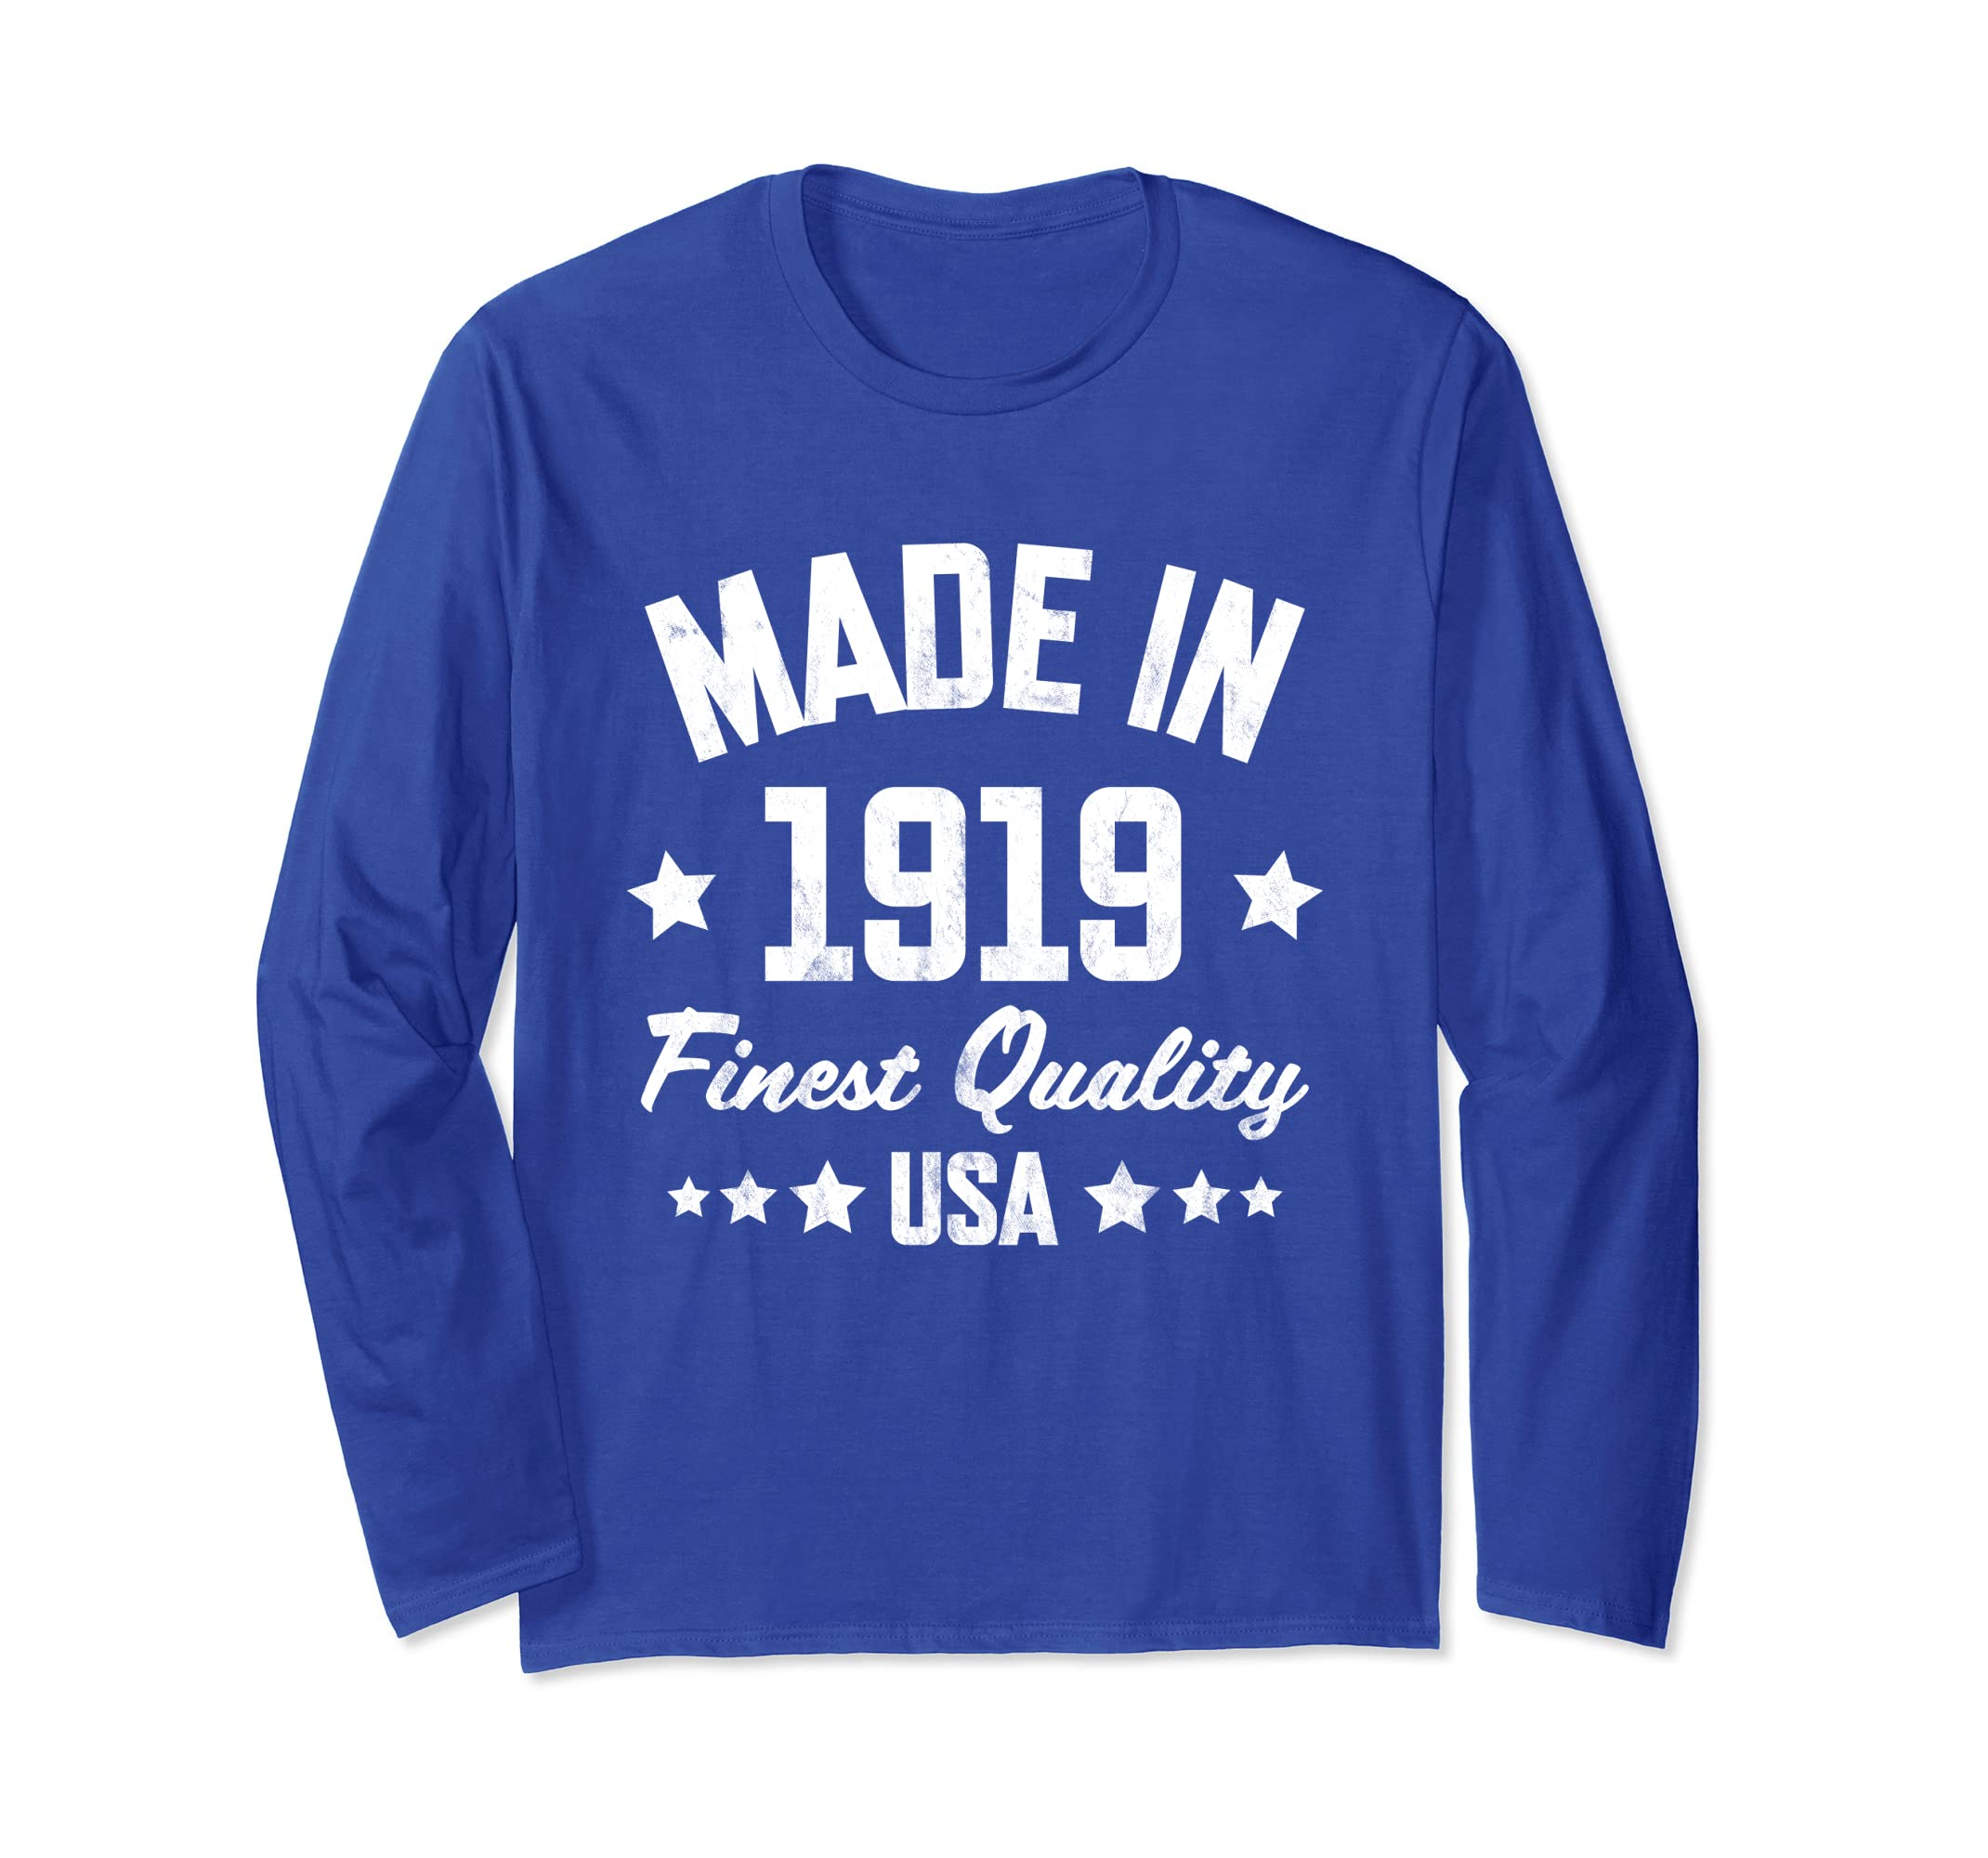 99th Birthday Long Sleeve : Made in 1919 Long Sleeve-Awarplus